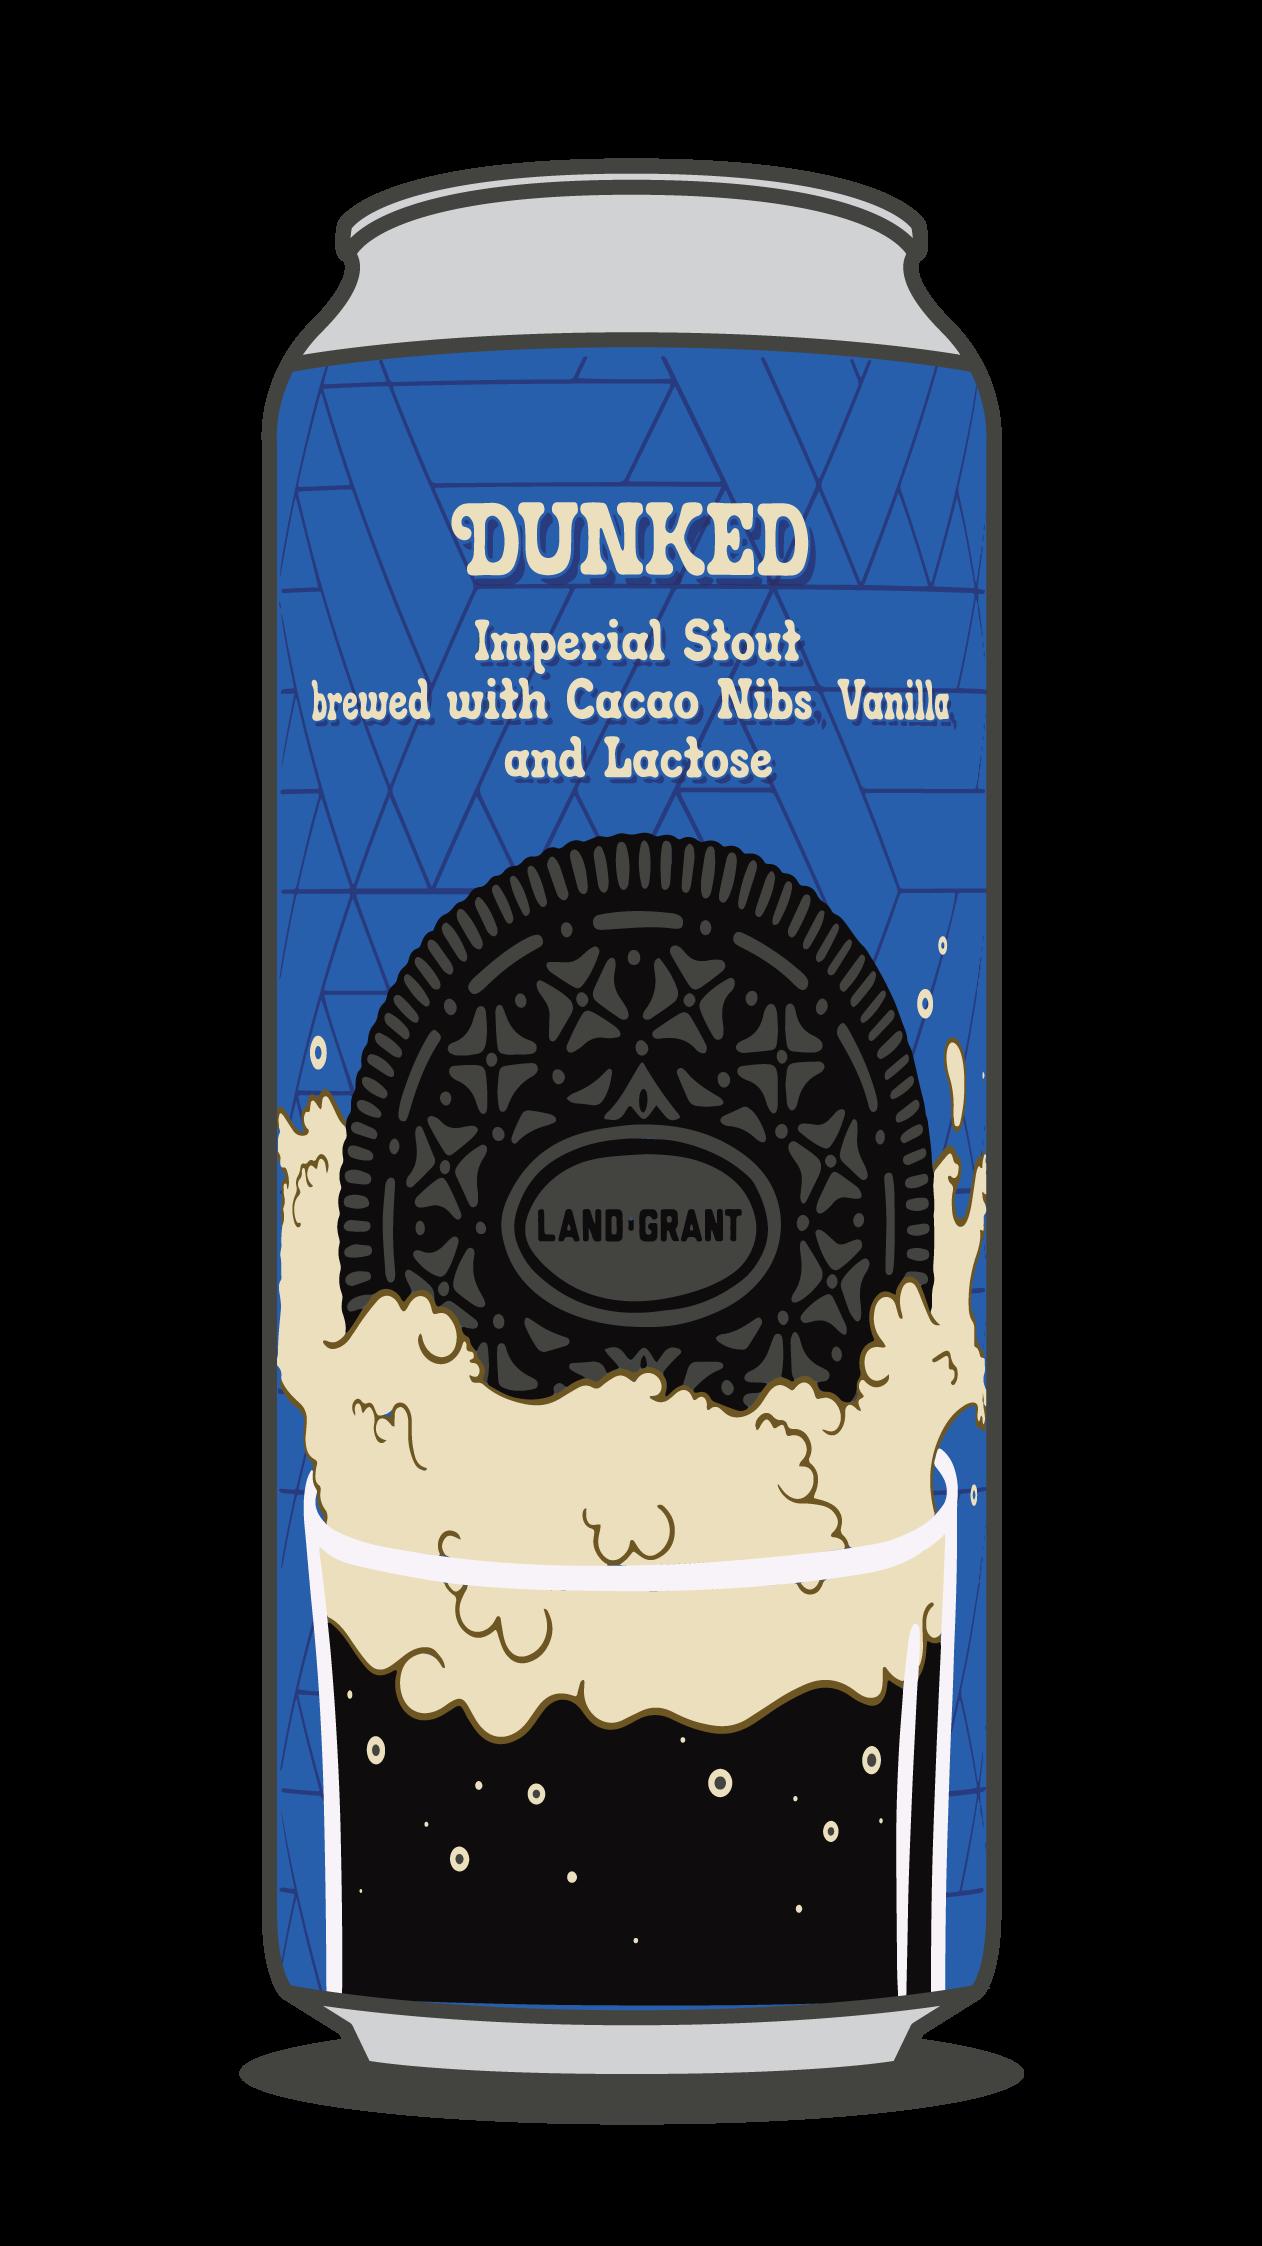 Dunked Image